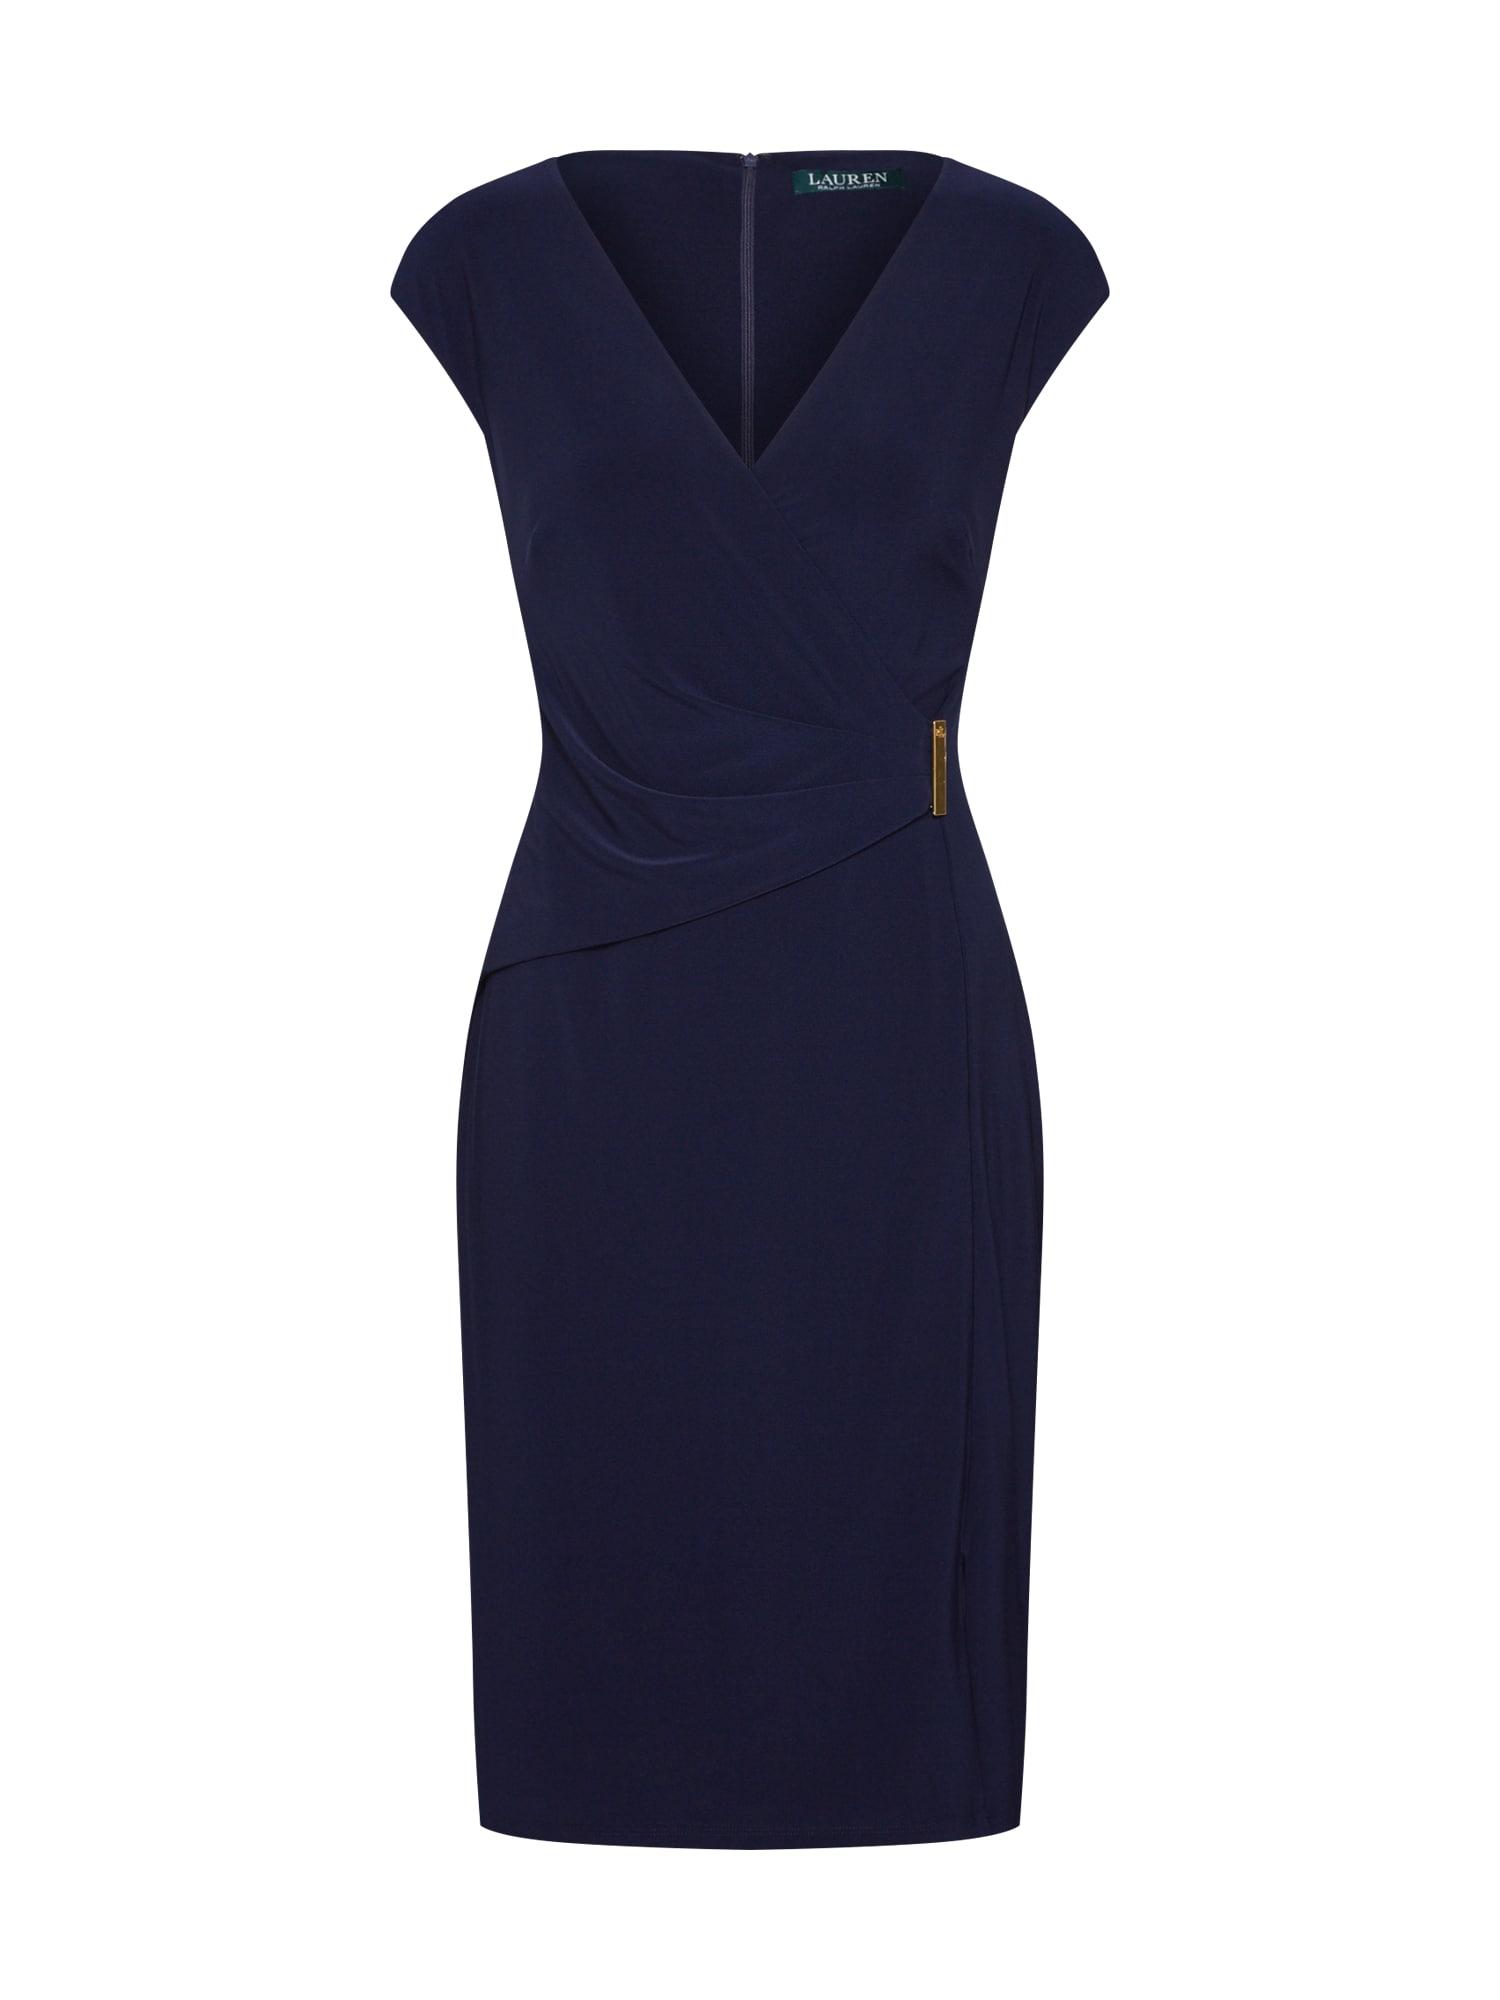 Pouzdrové šaty AIDEENA námořnická modř Lauren Ralph Lauren